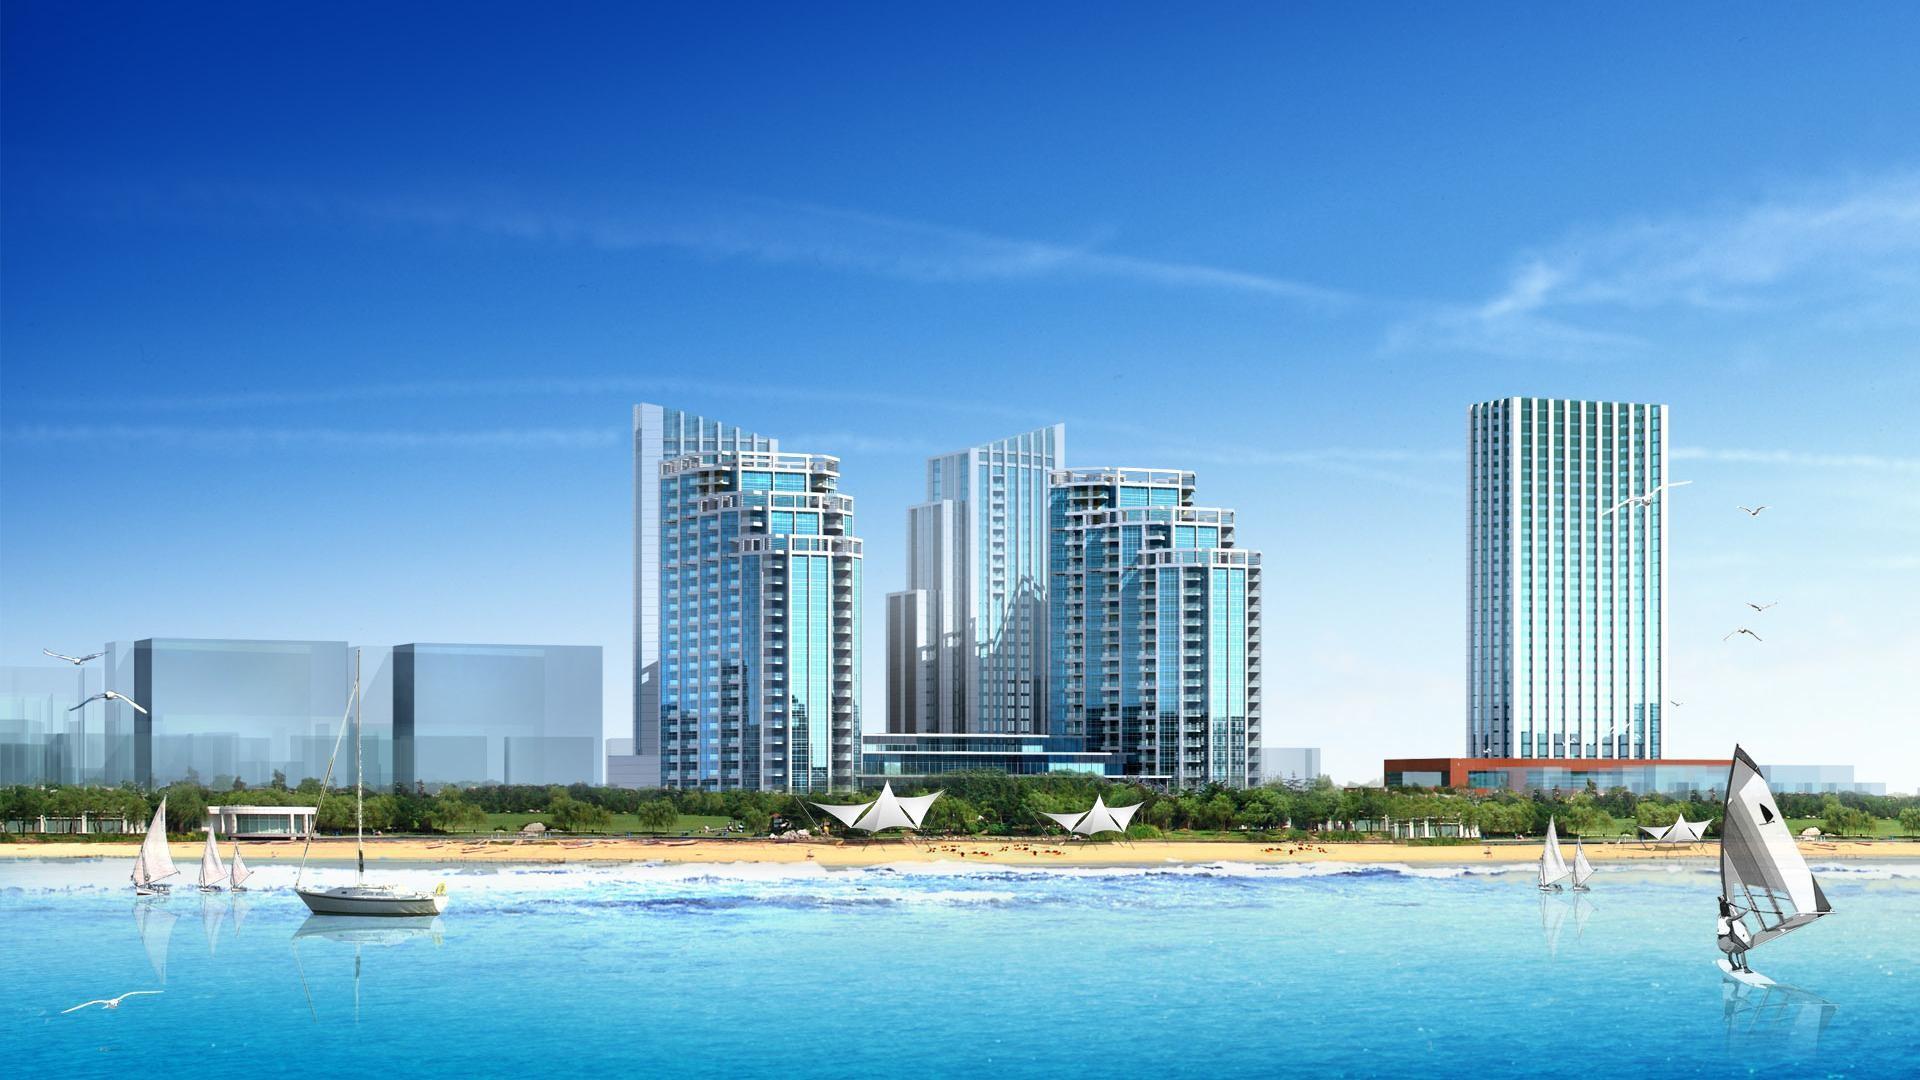 cool hd coastal city desktop background wide wallpapers:1280×800,1440×900,1680×1050  –